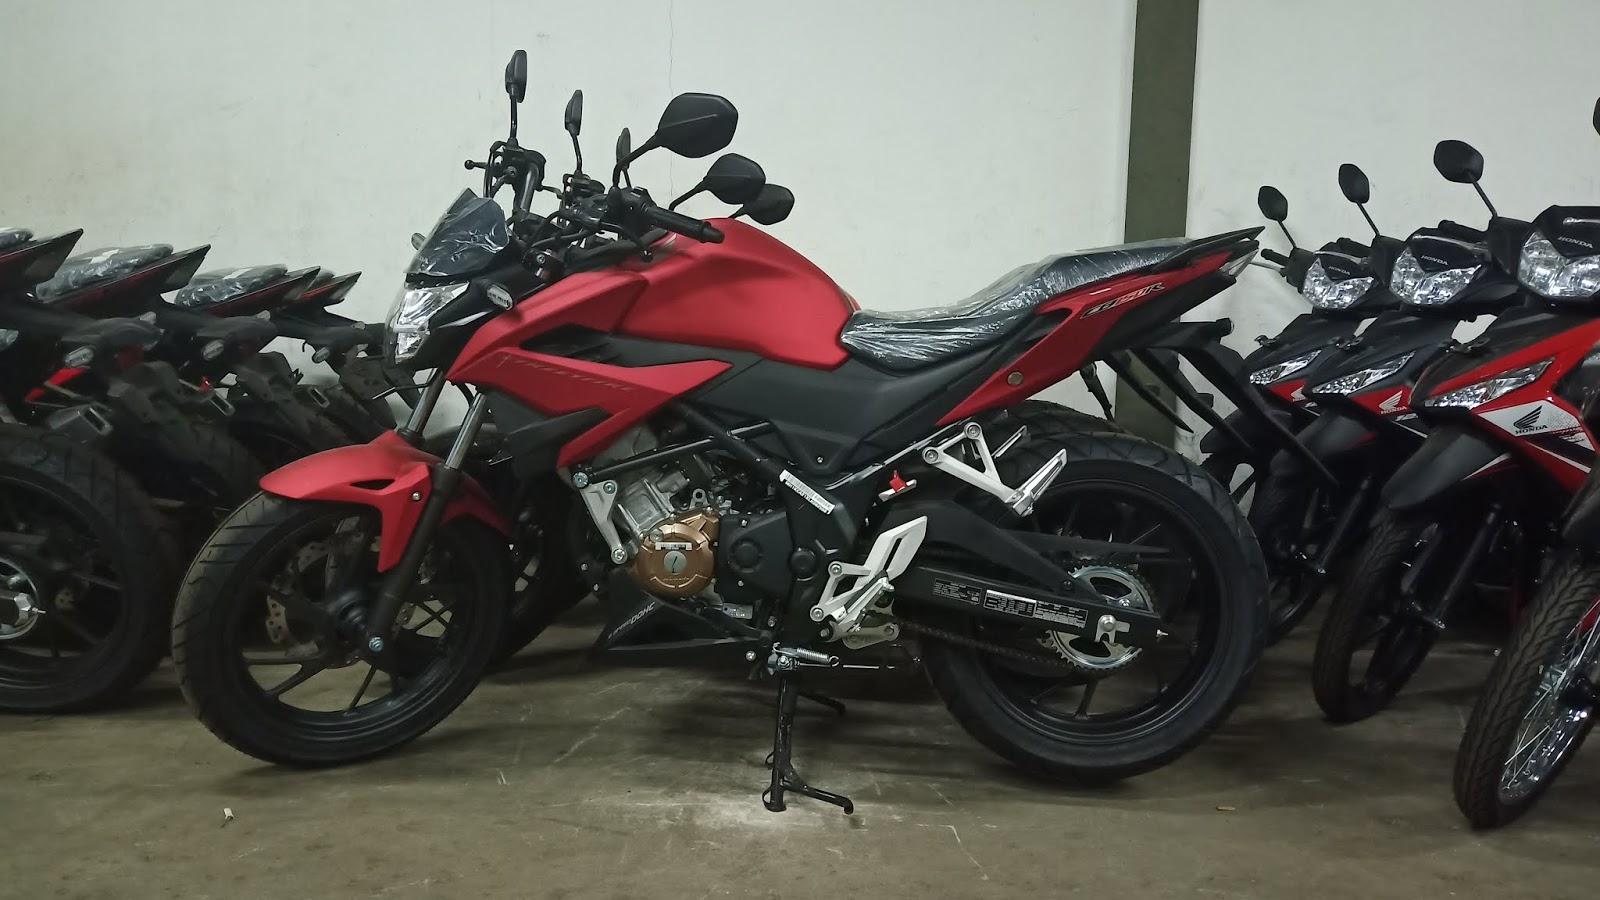 Harga Kredit Motor Honda CB 150R Bekasi dan Sekitarnya